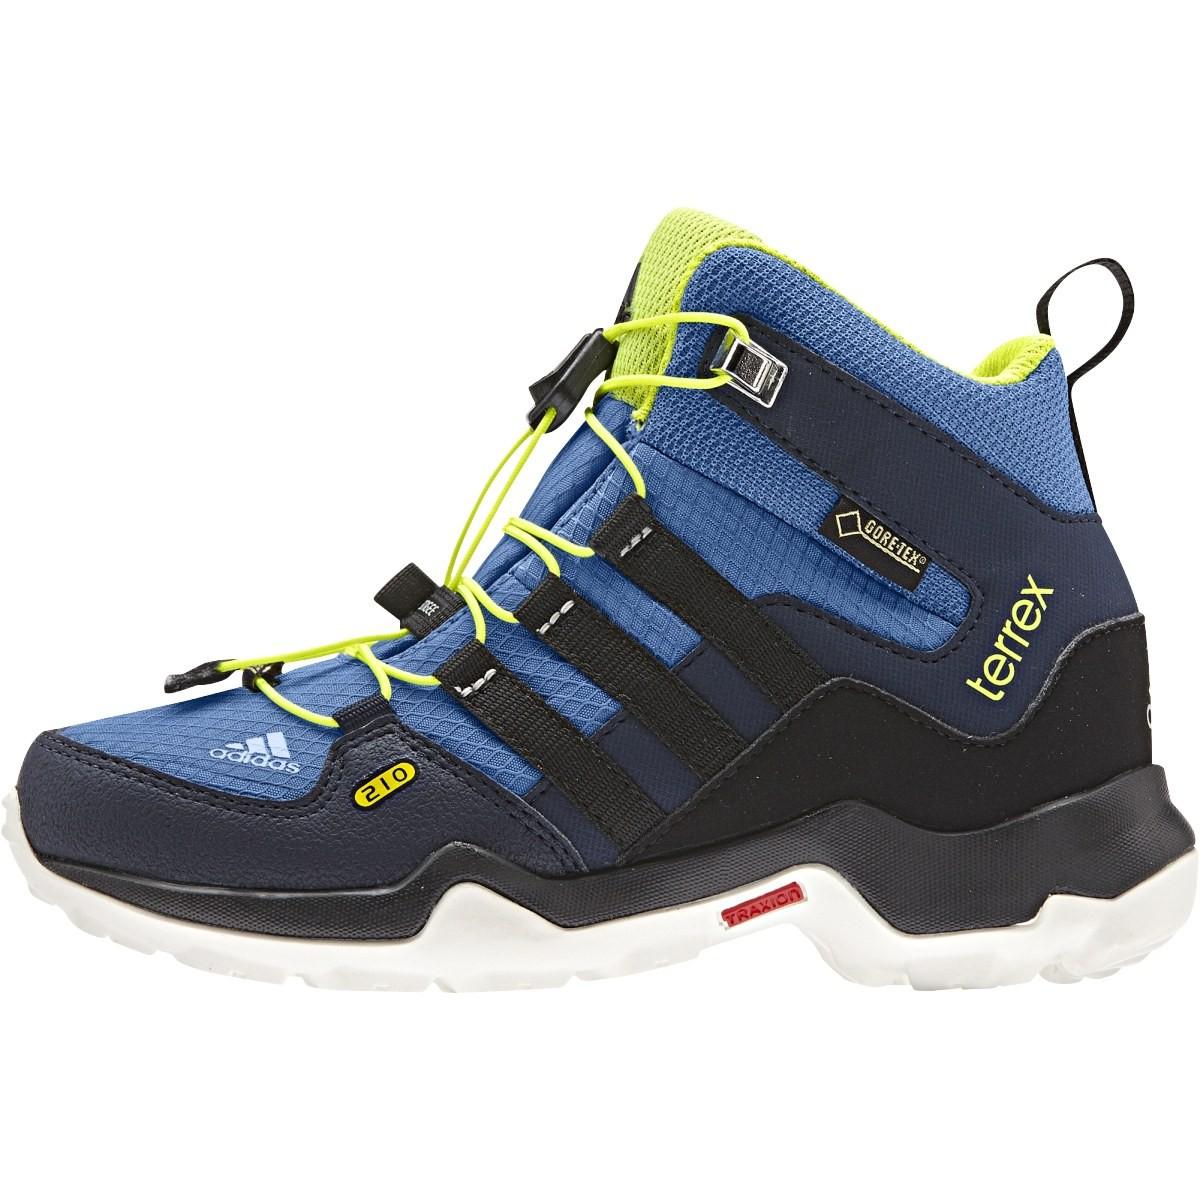 d2d2f25c07 Dětská treková obuv adidas TERREX MID GTX K